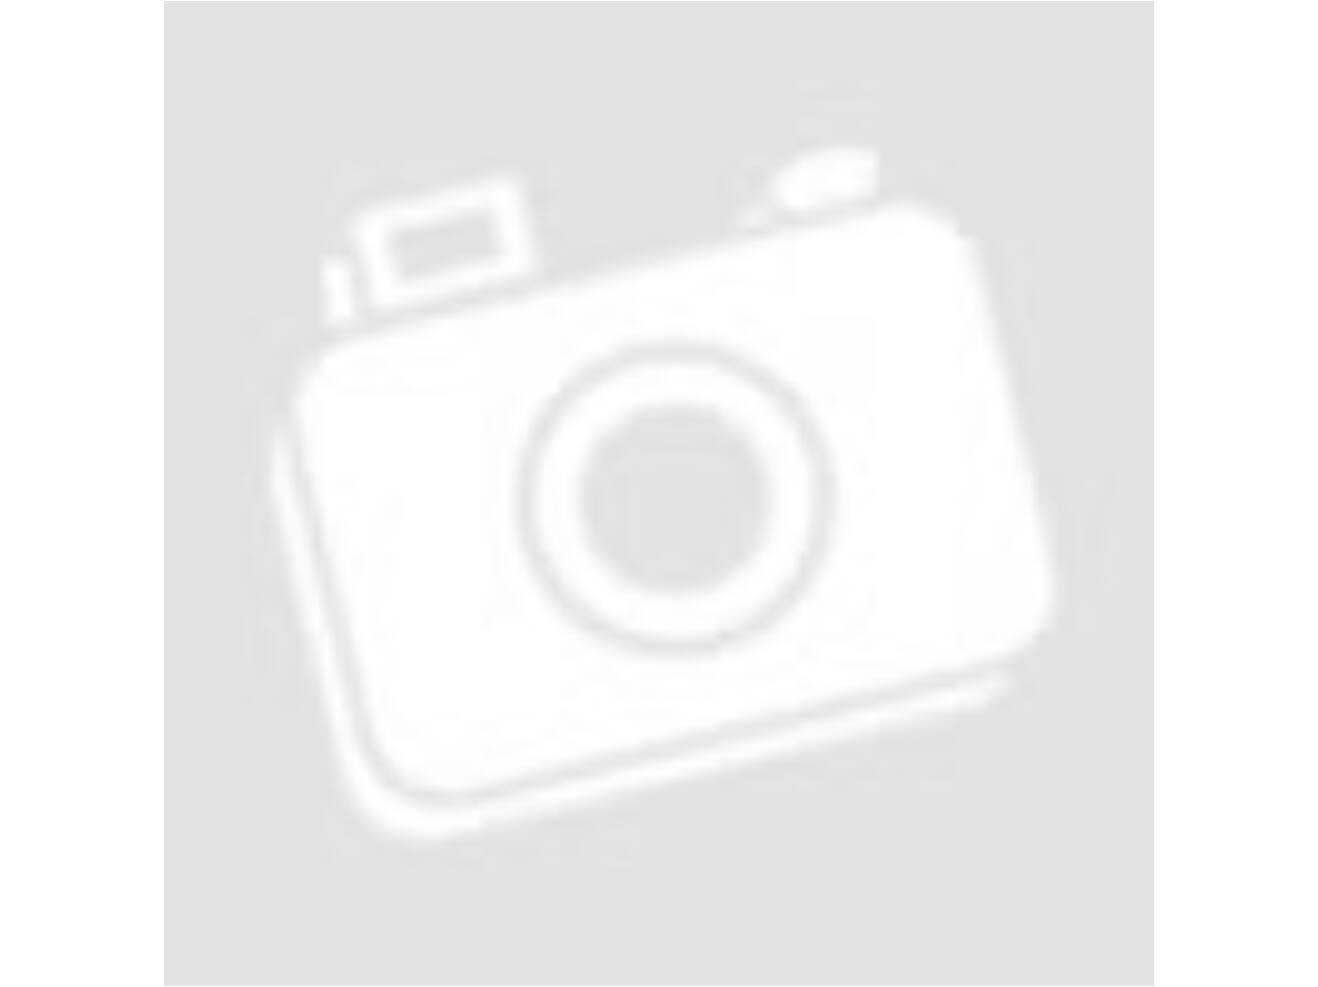 NIKE MAGISTA OPUS FG - FG AG (Műanyag stoplis) - Alexandersoccershoes 060109e8be